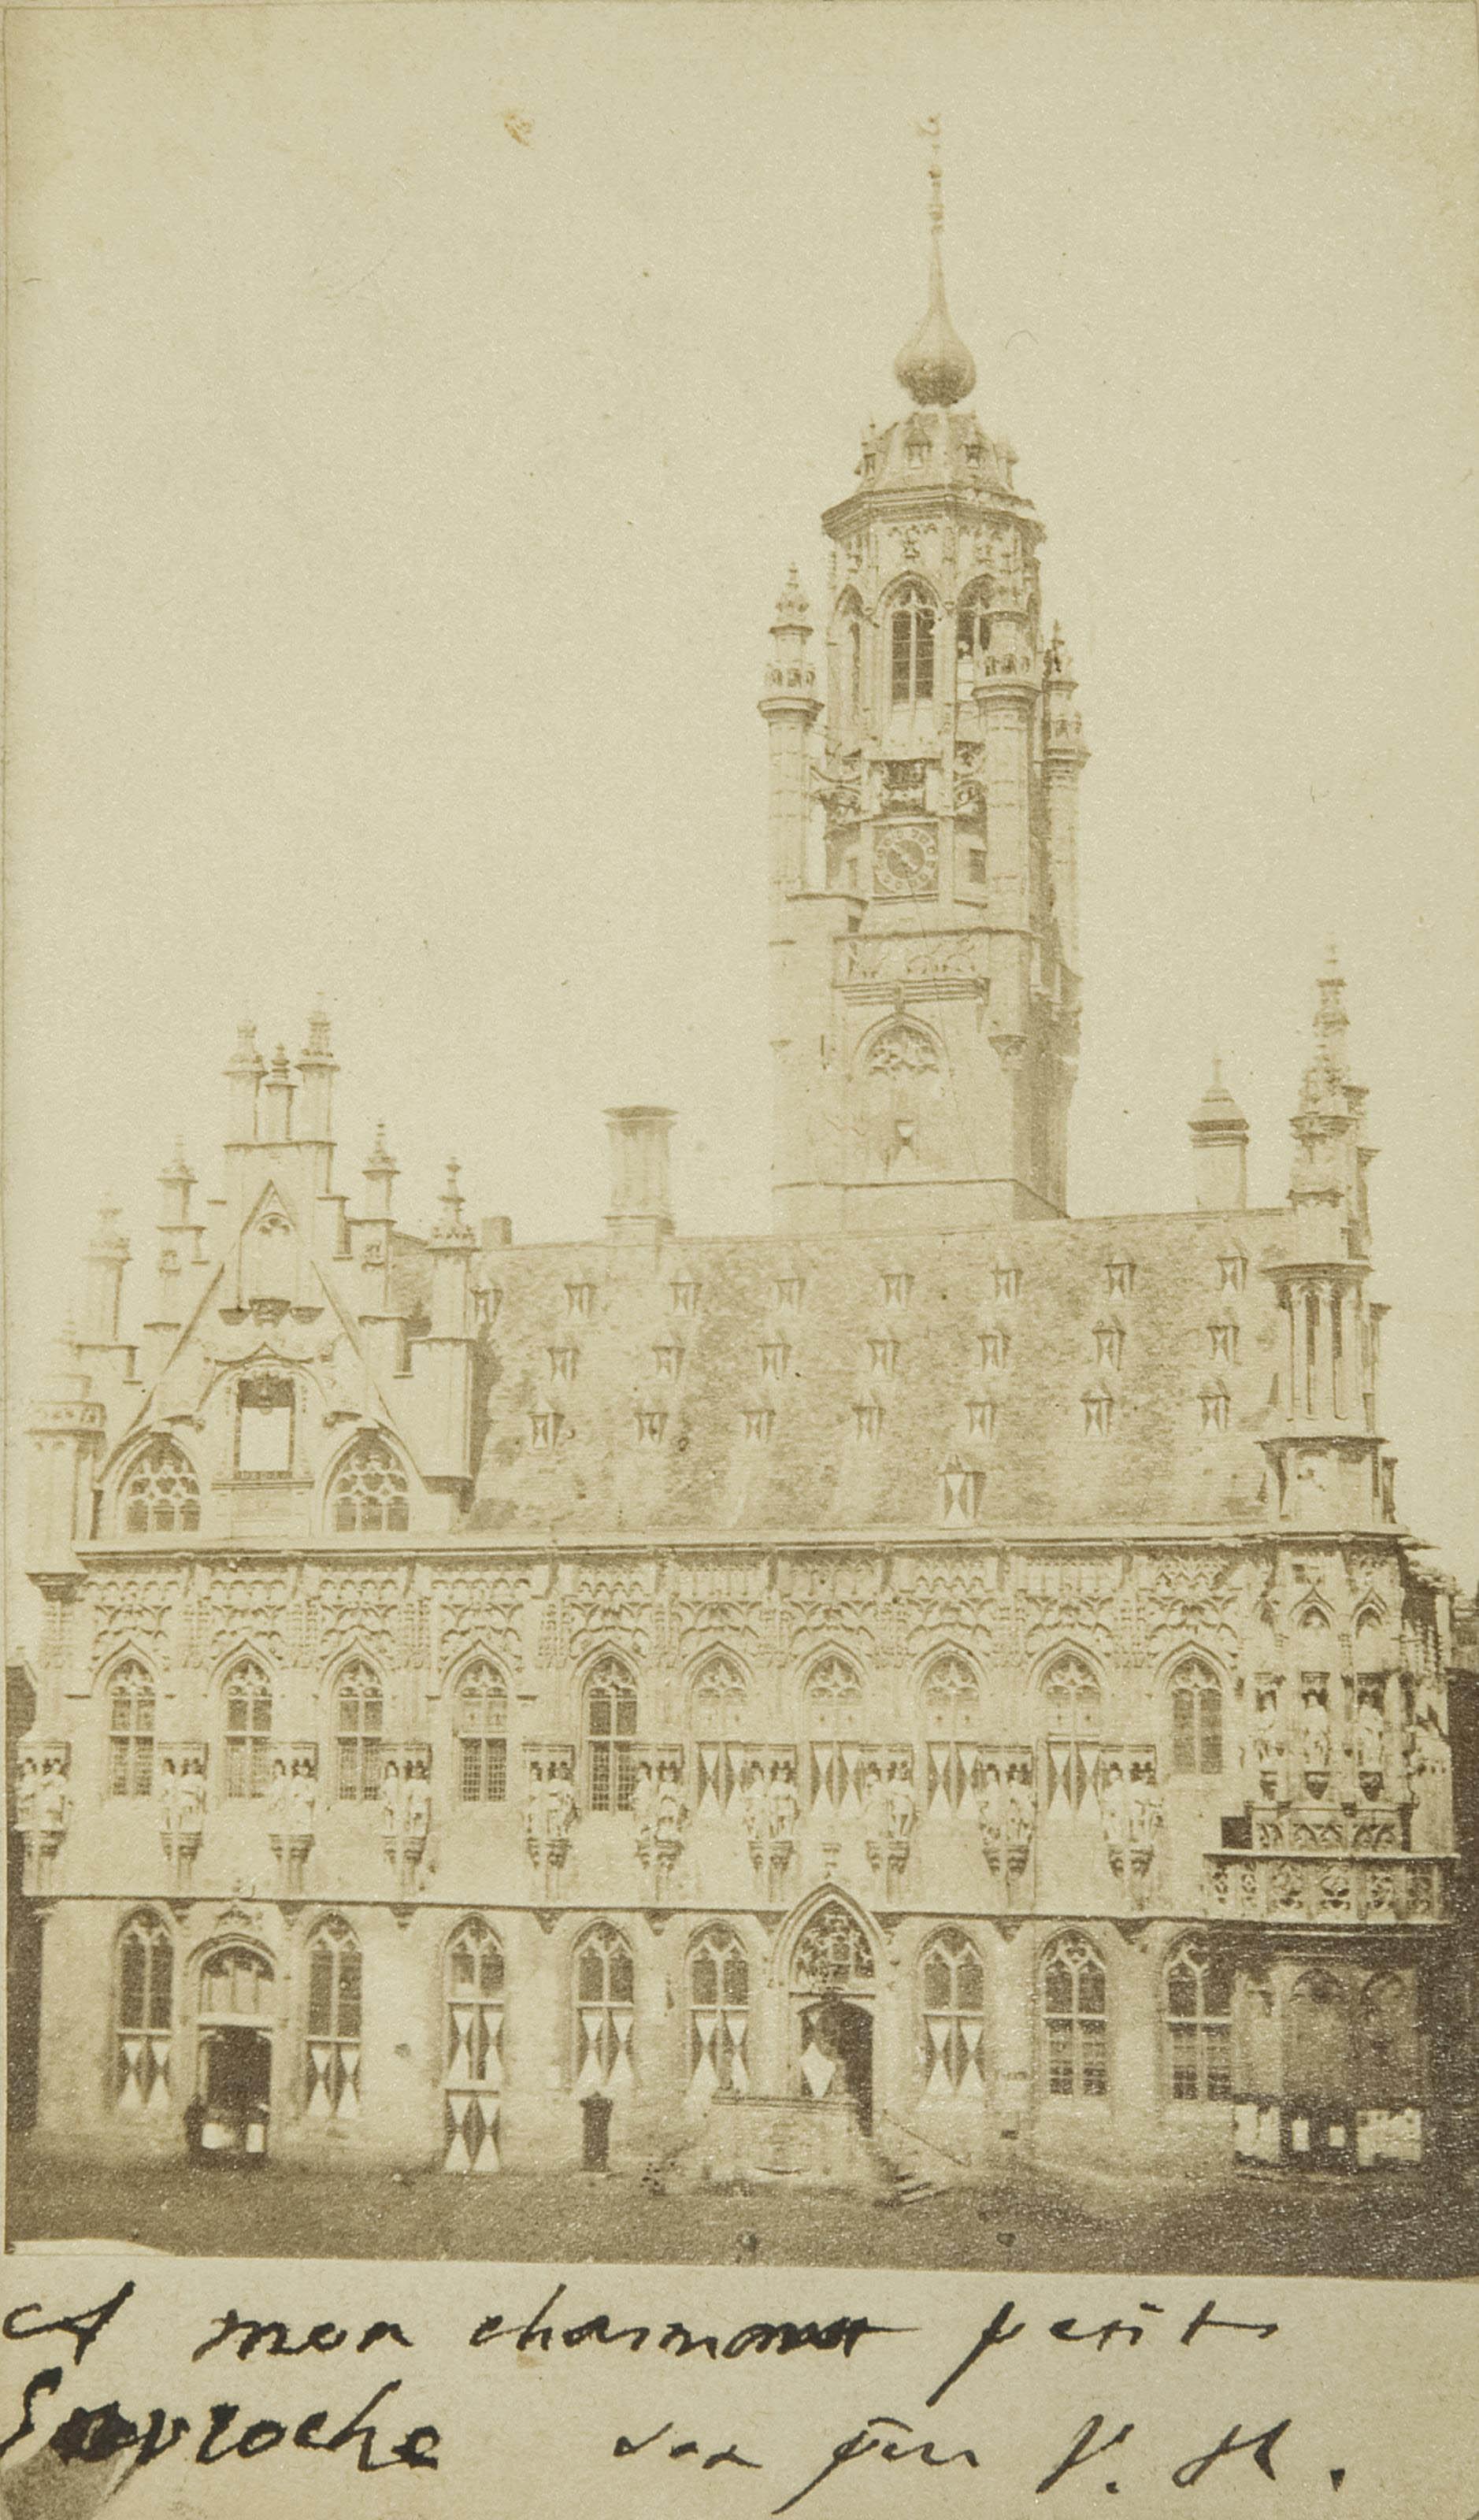 [CHARLES HUGO]. Victor Hugo en Zélande. Paris: Michel Lévy, 1868.